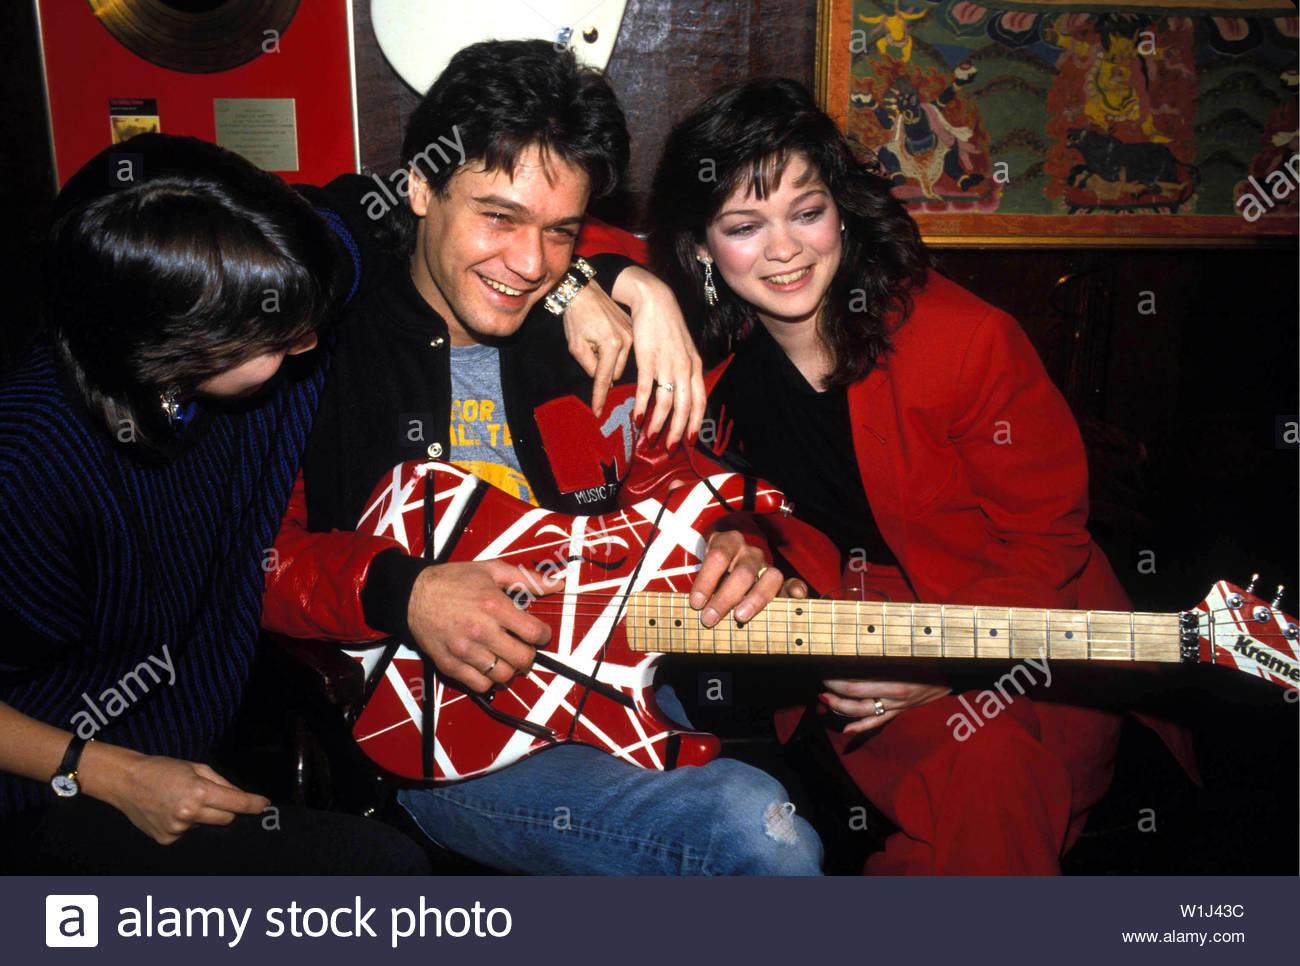 Valerie Bertinelli And Eddie Van Halen In 1985 Credit 3773528globe Photos Mediapunch Stock Photo Alamy